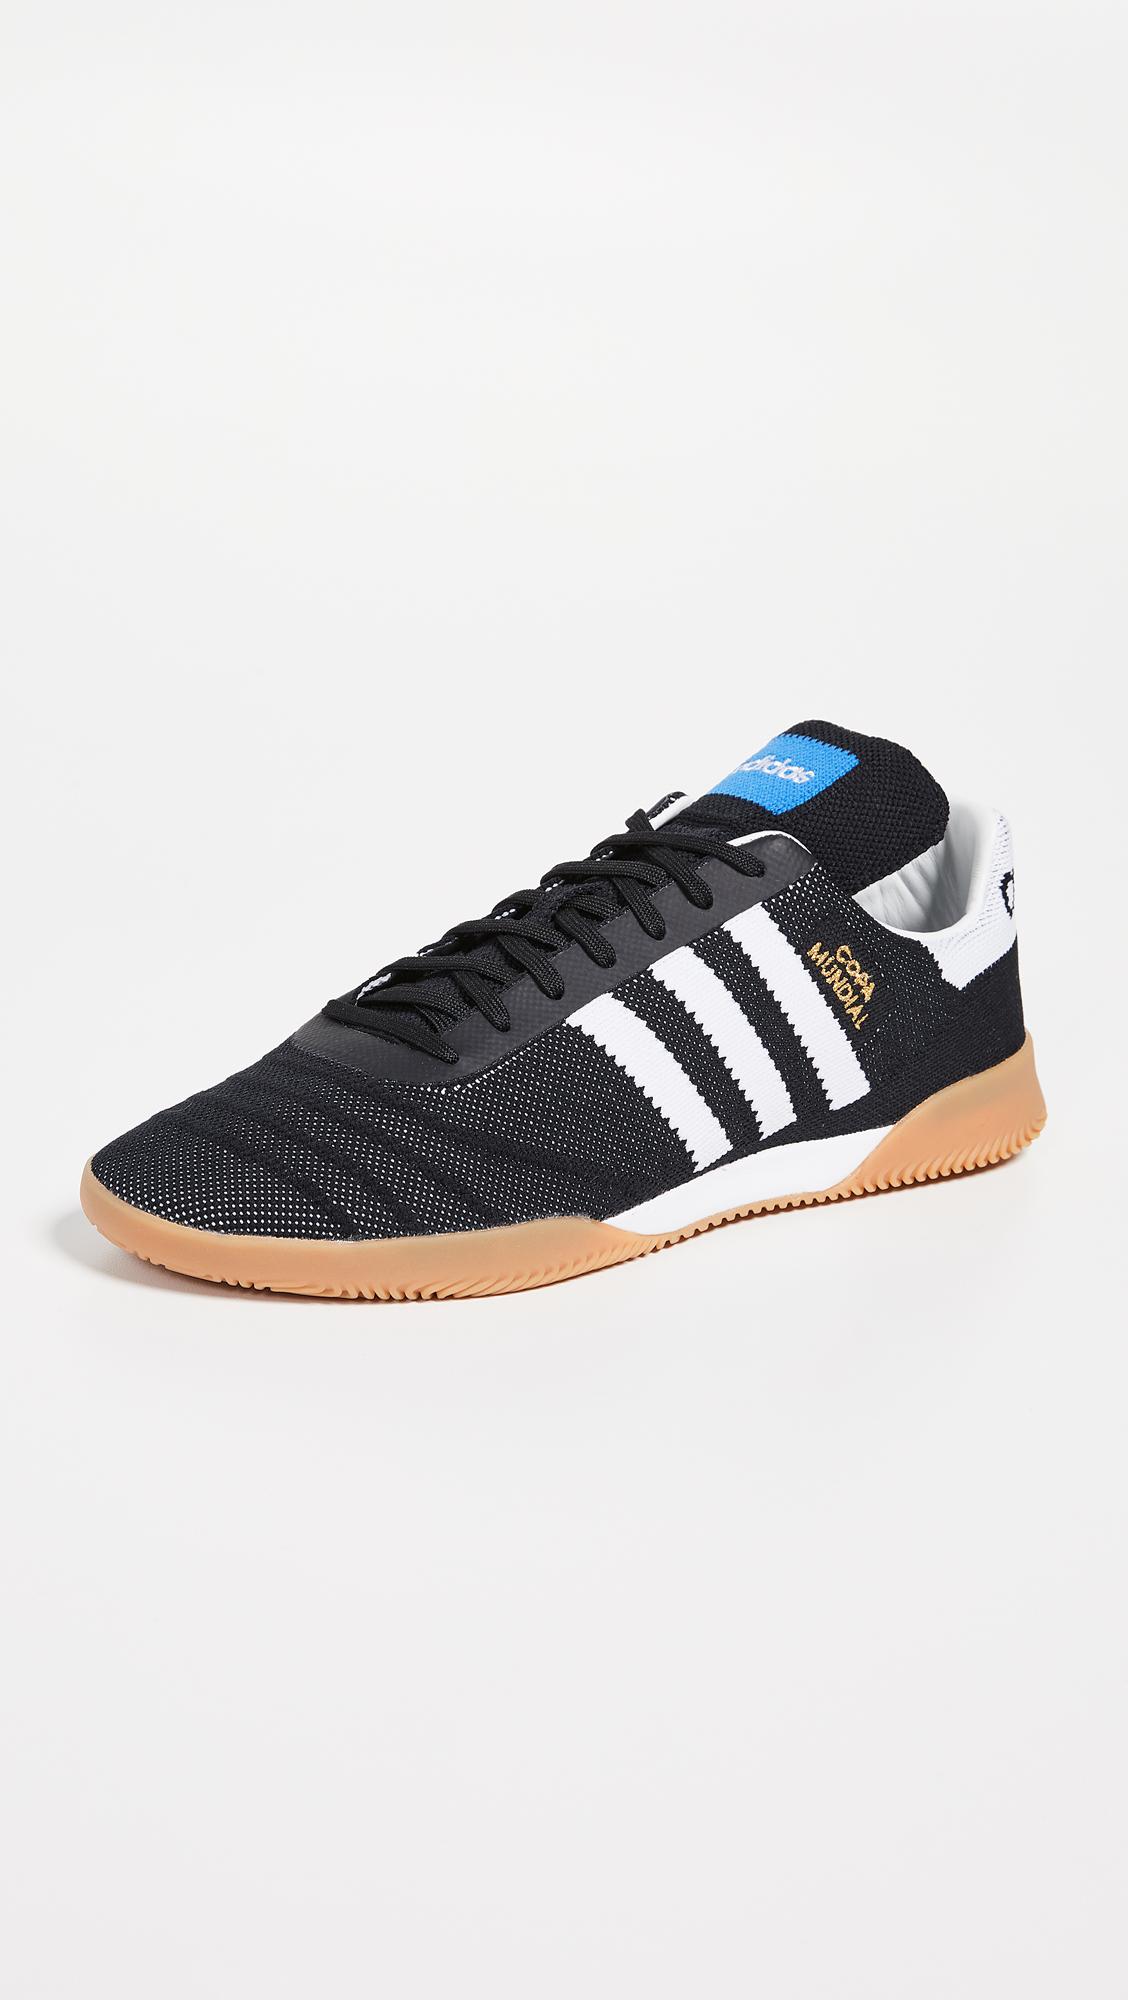 e0b8bfd80570f adidas x Football Copa 70 Year Sneakers | EAST DANE